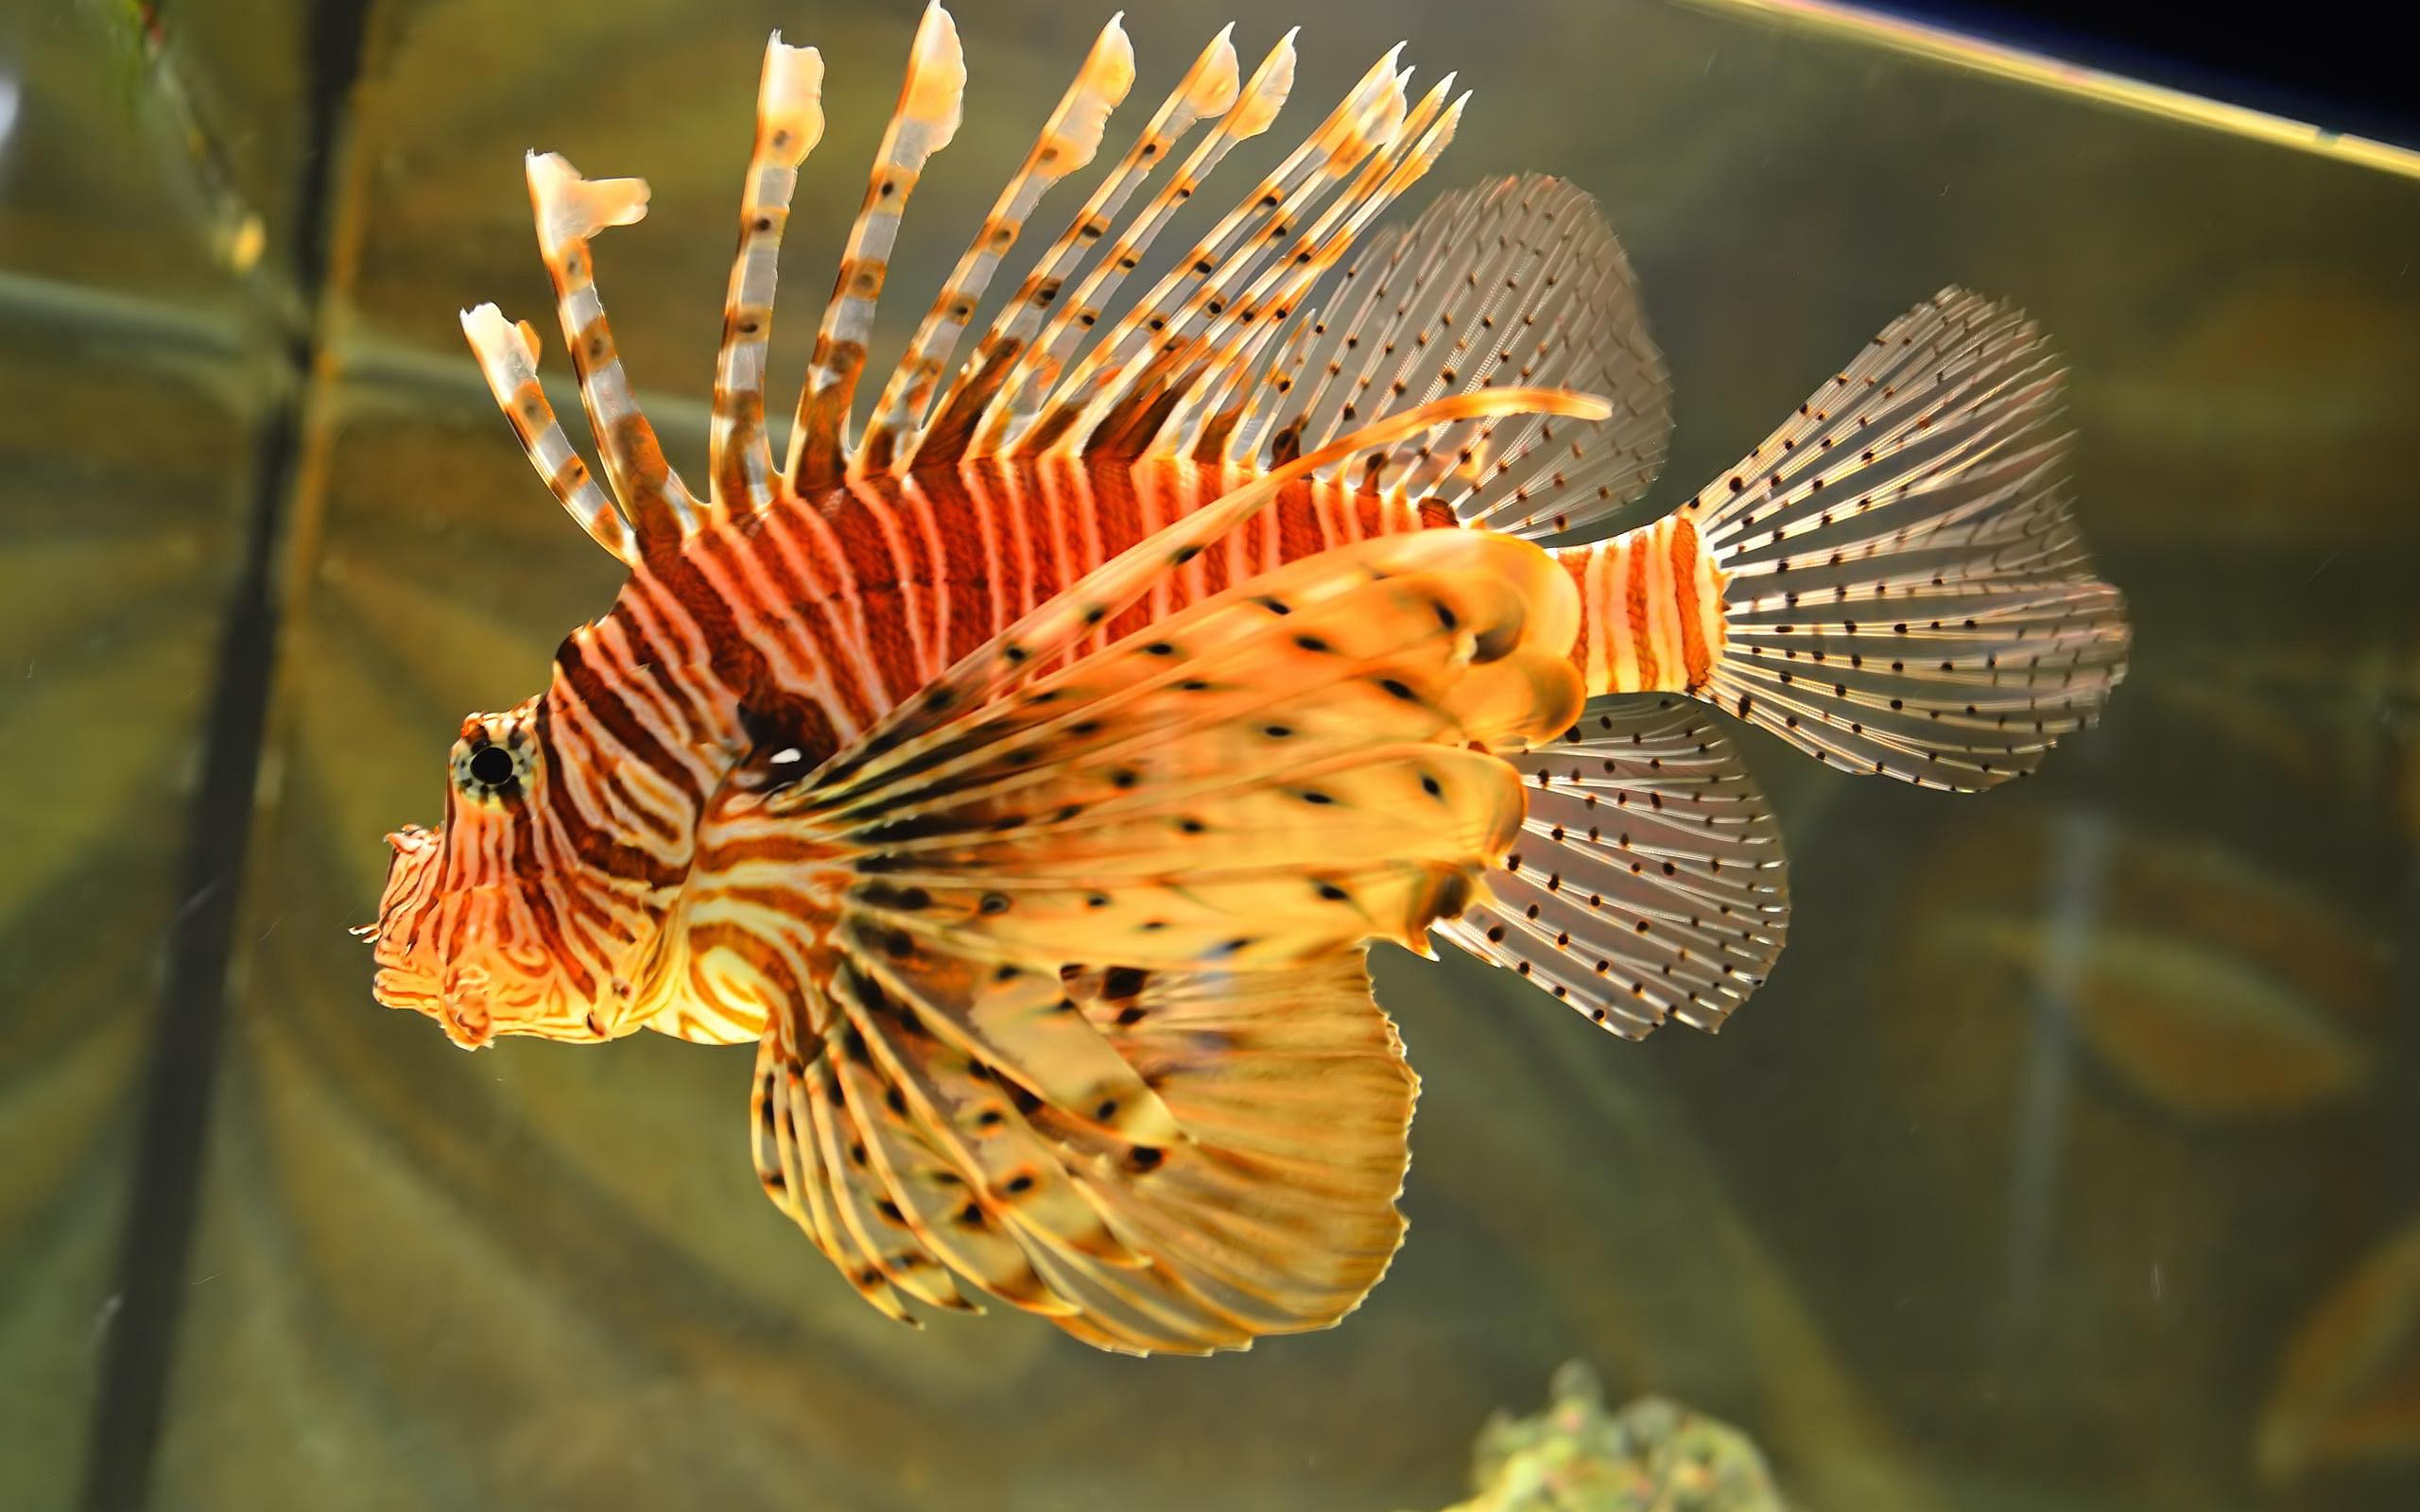 3d Wallpaper Live Fish Lionfish Hd Desktop Wallpapers 4k Hd